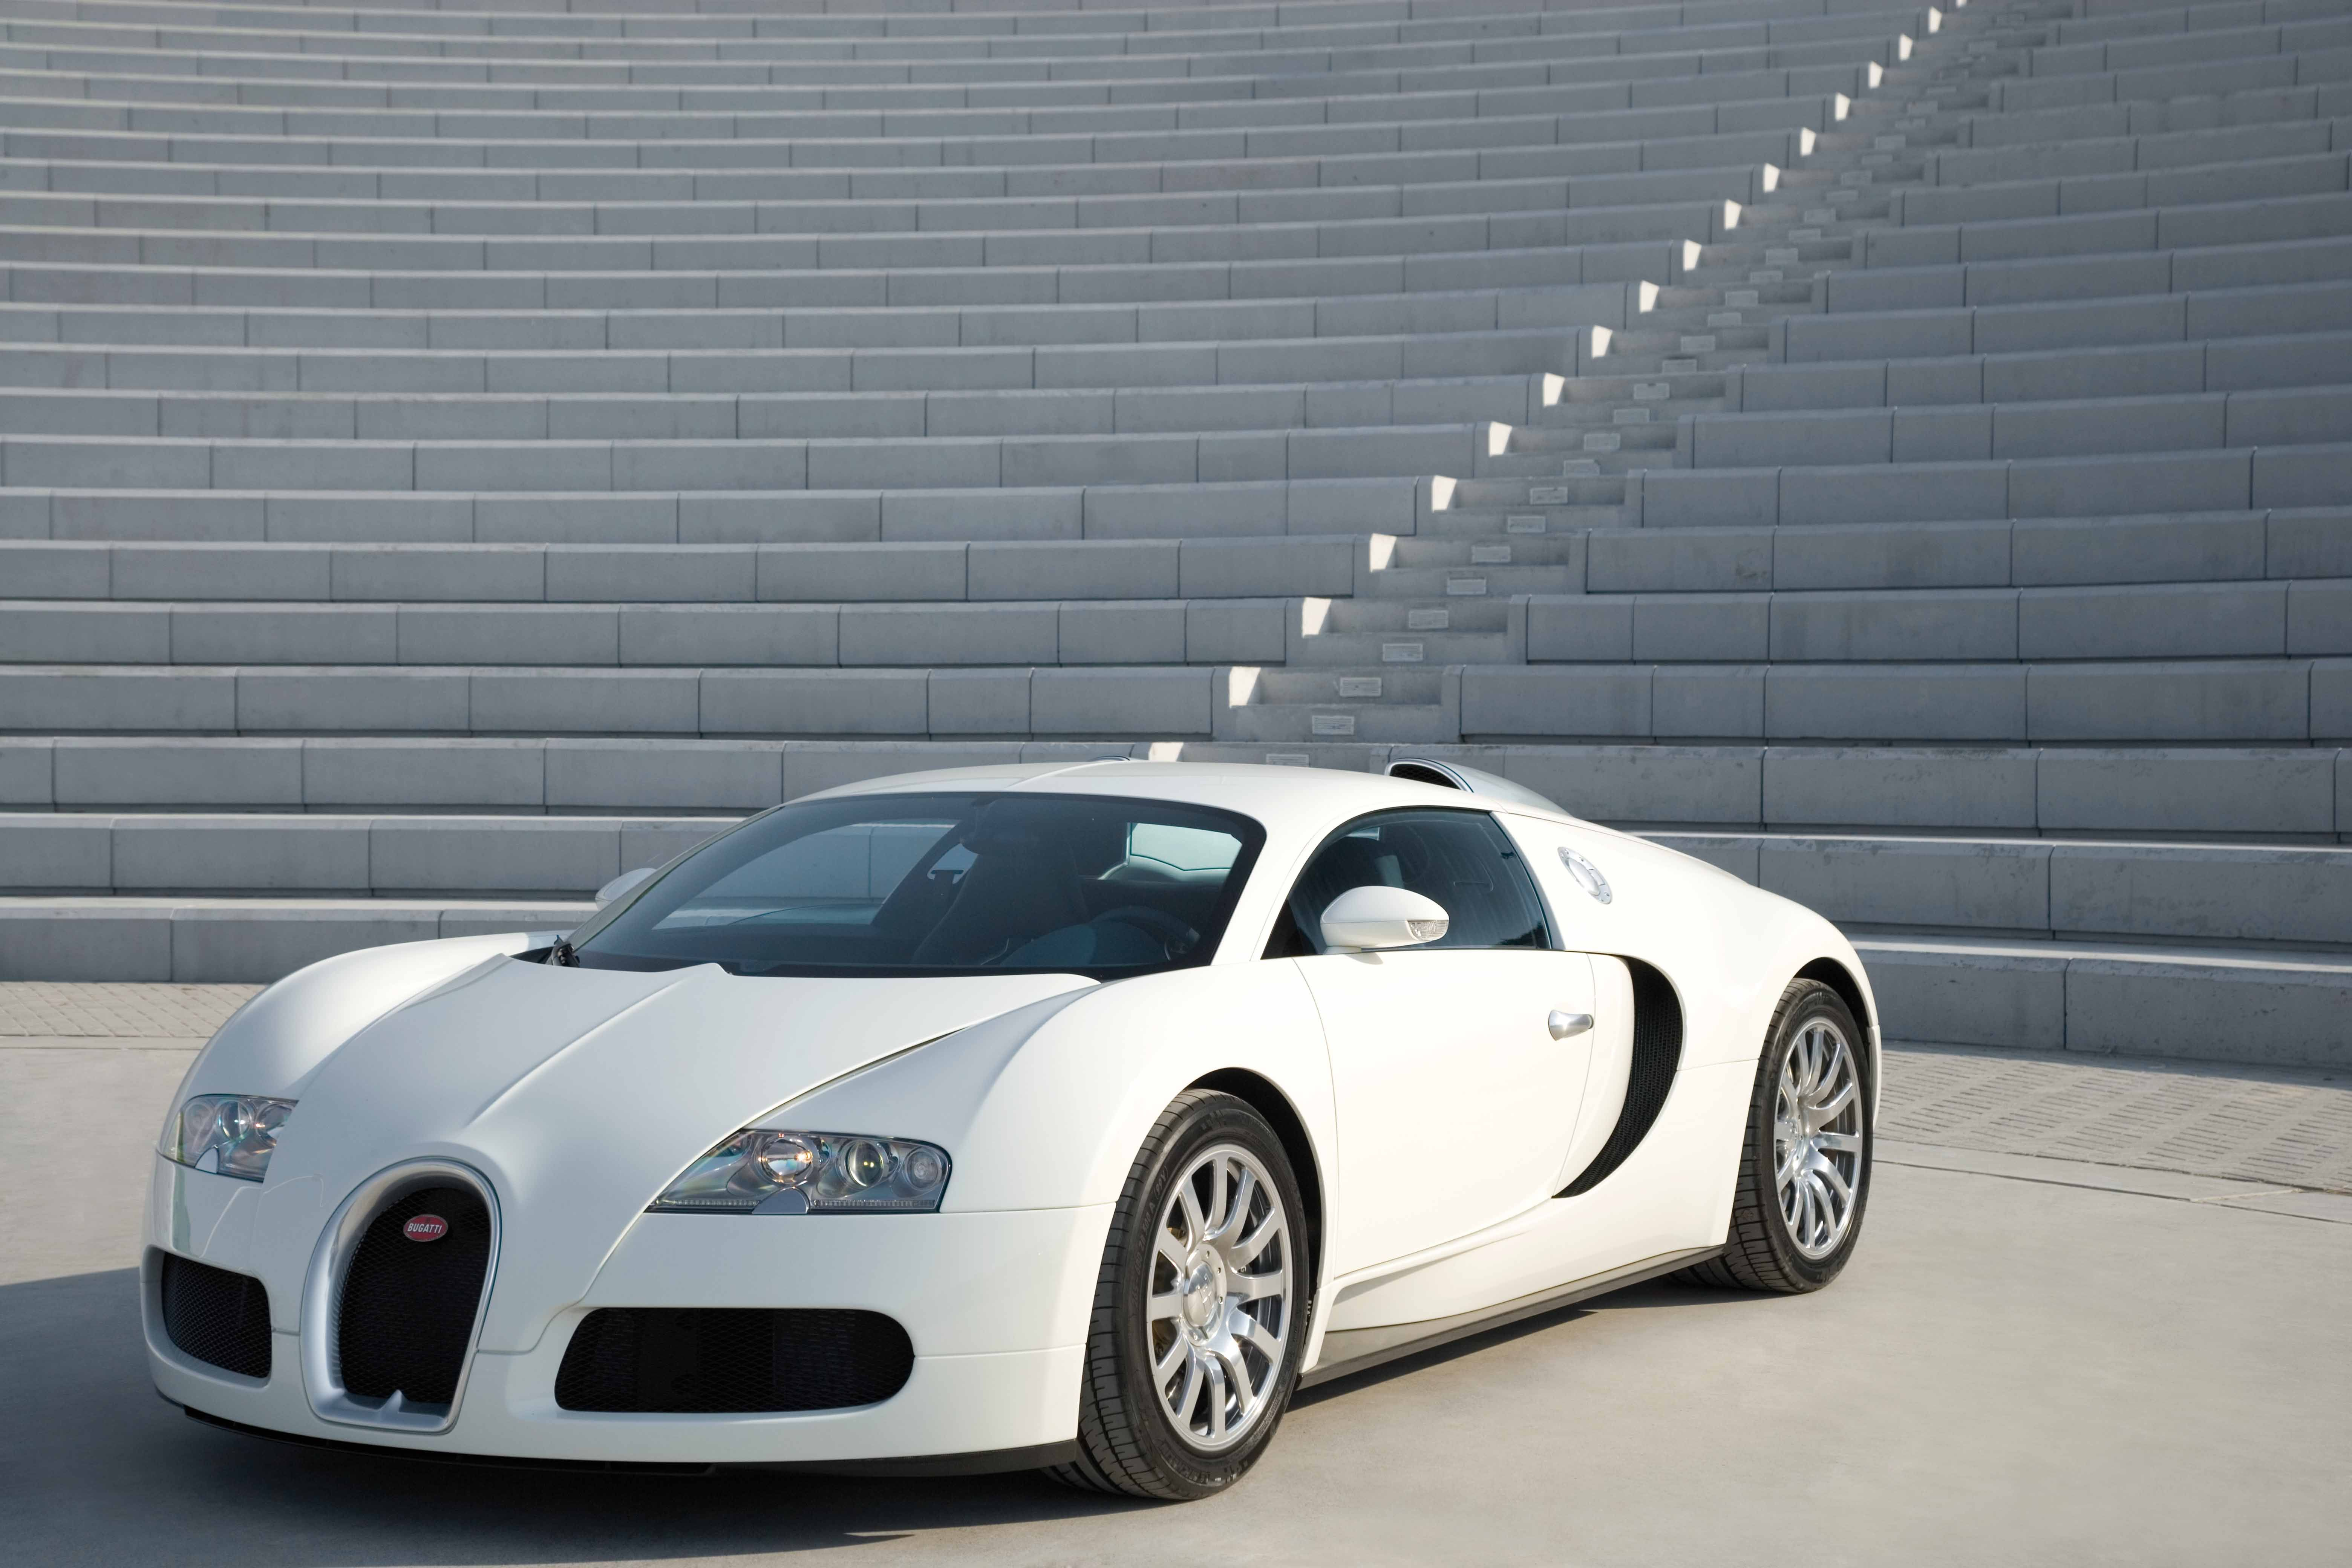 0ba21889bd71e27fcf3c82a854970115 Stunning Bugatti Veyron Super Sport White Cars Trend